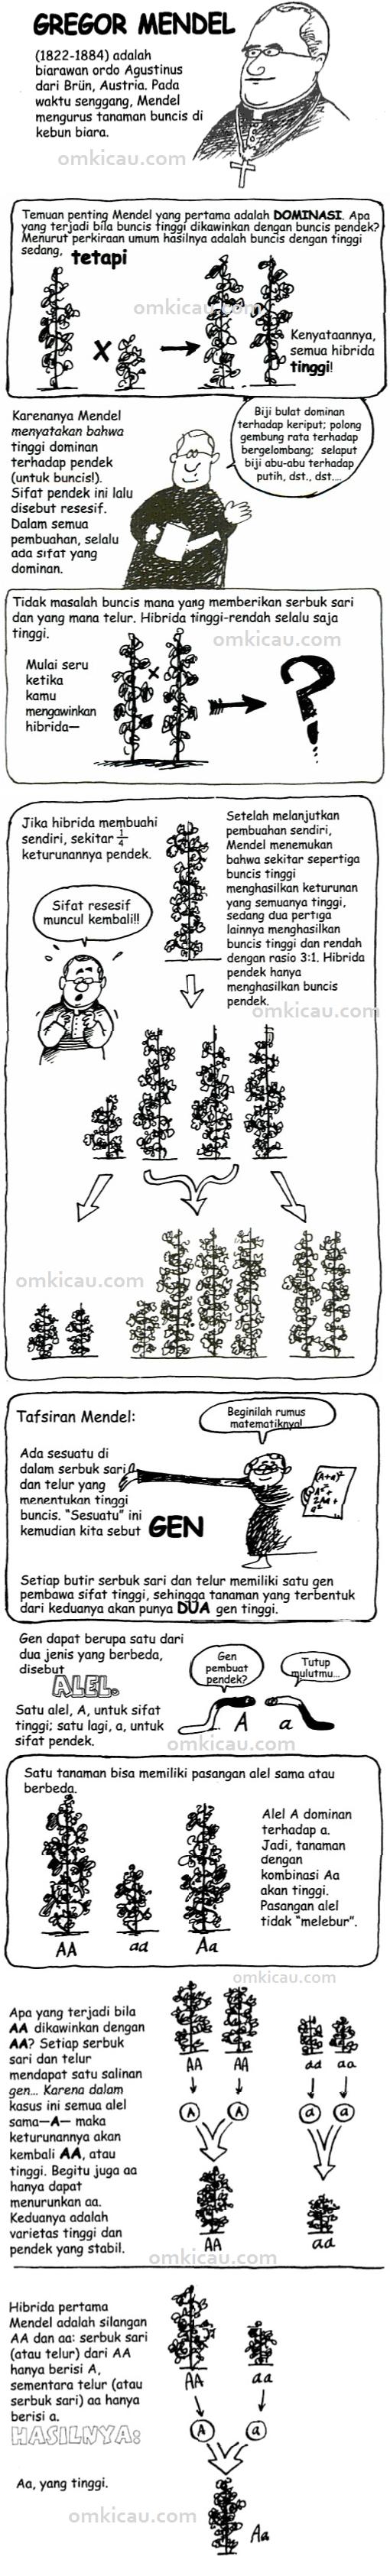 Teori Genetika Mendel-omkicau